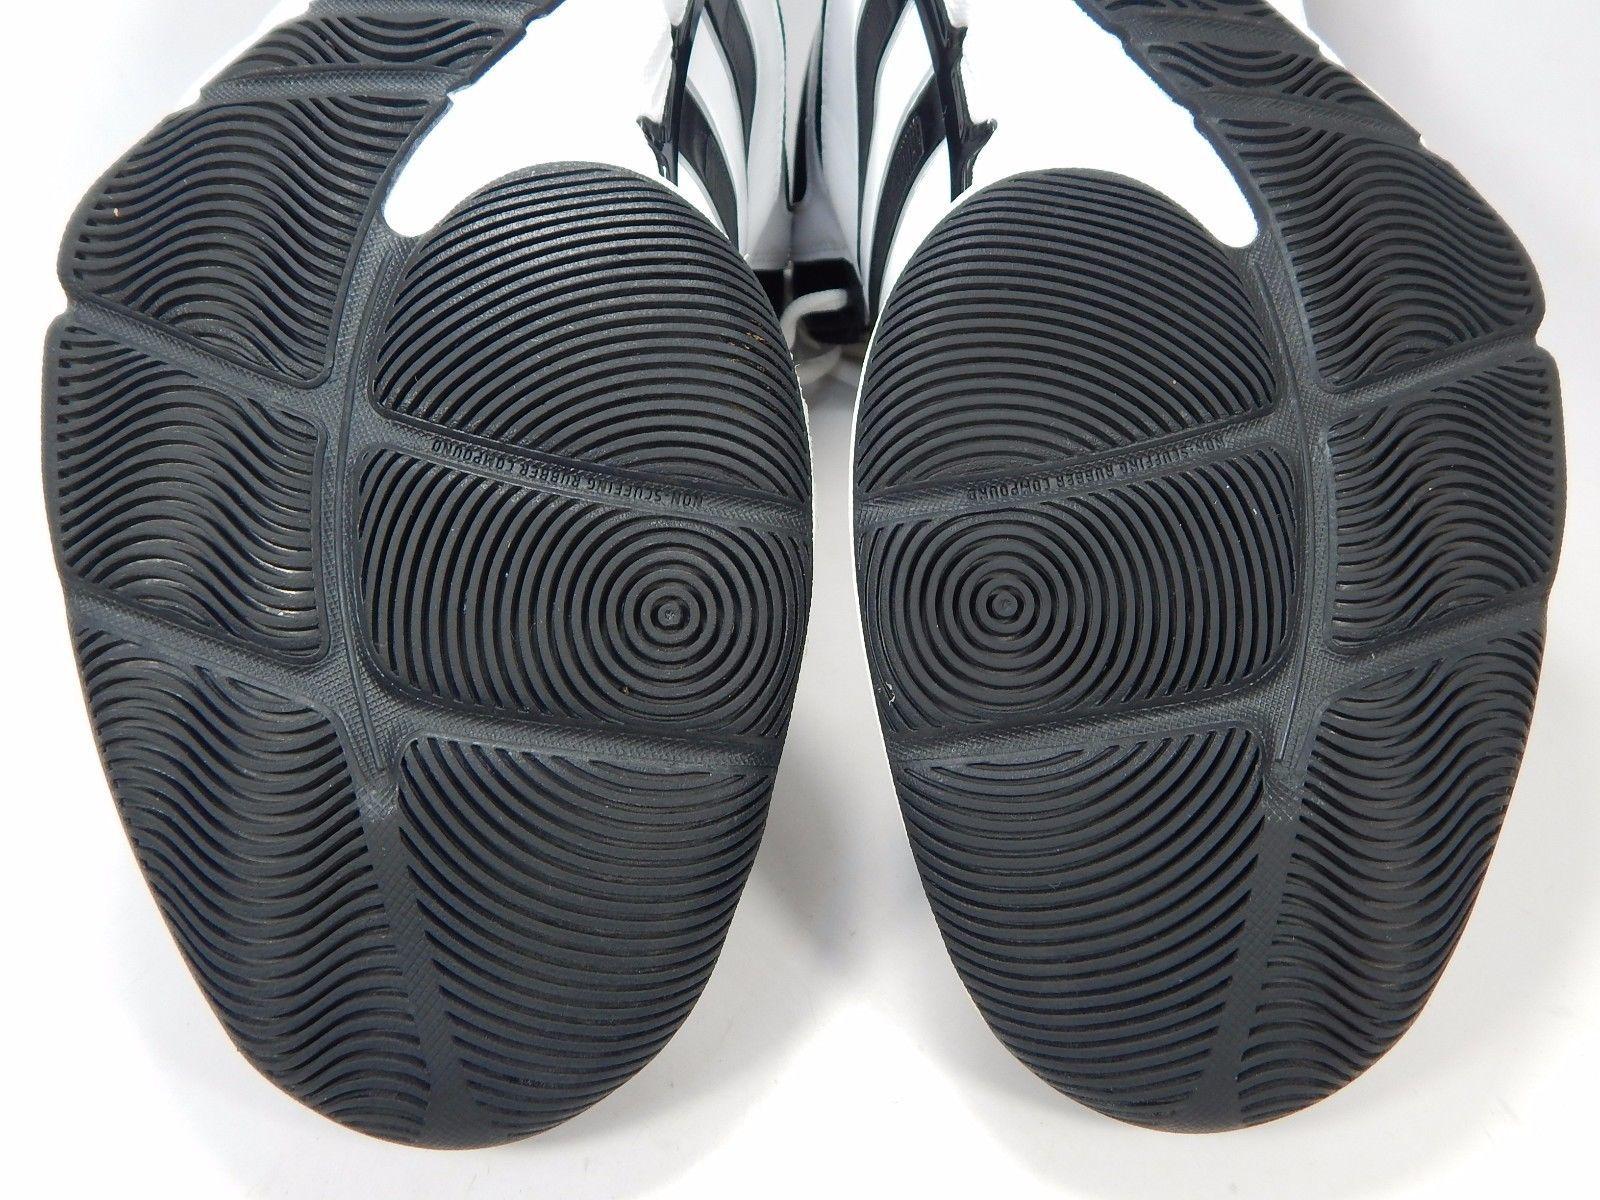 Adidas Pro Model Zero Women's Basketball Shoes Size US 12 M (D) EU 45 1/3 White